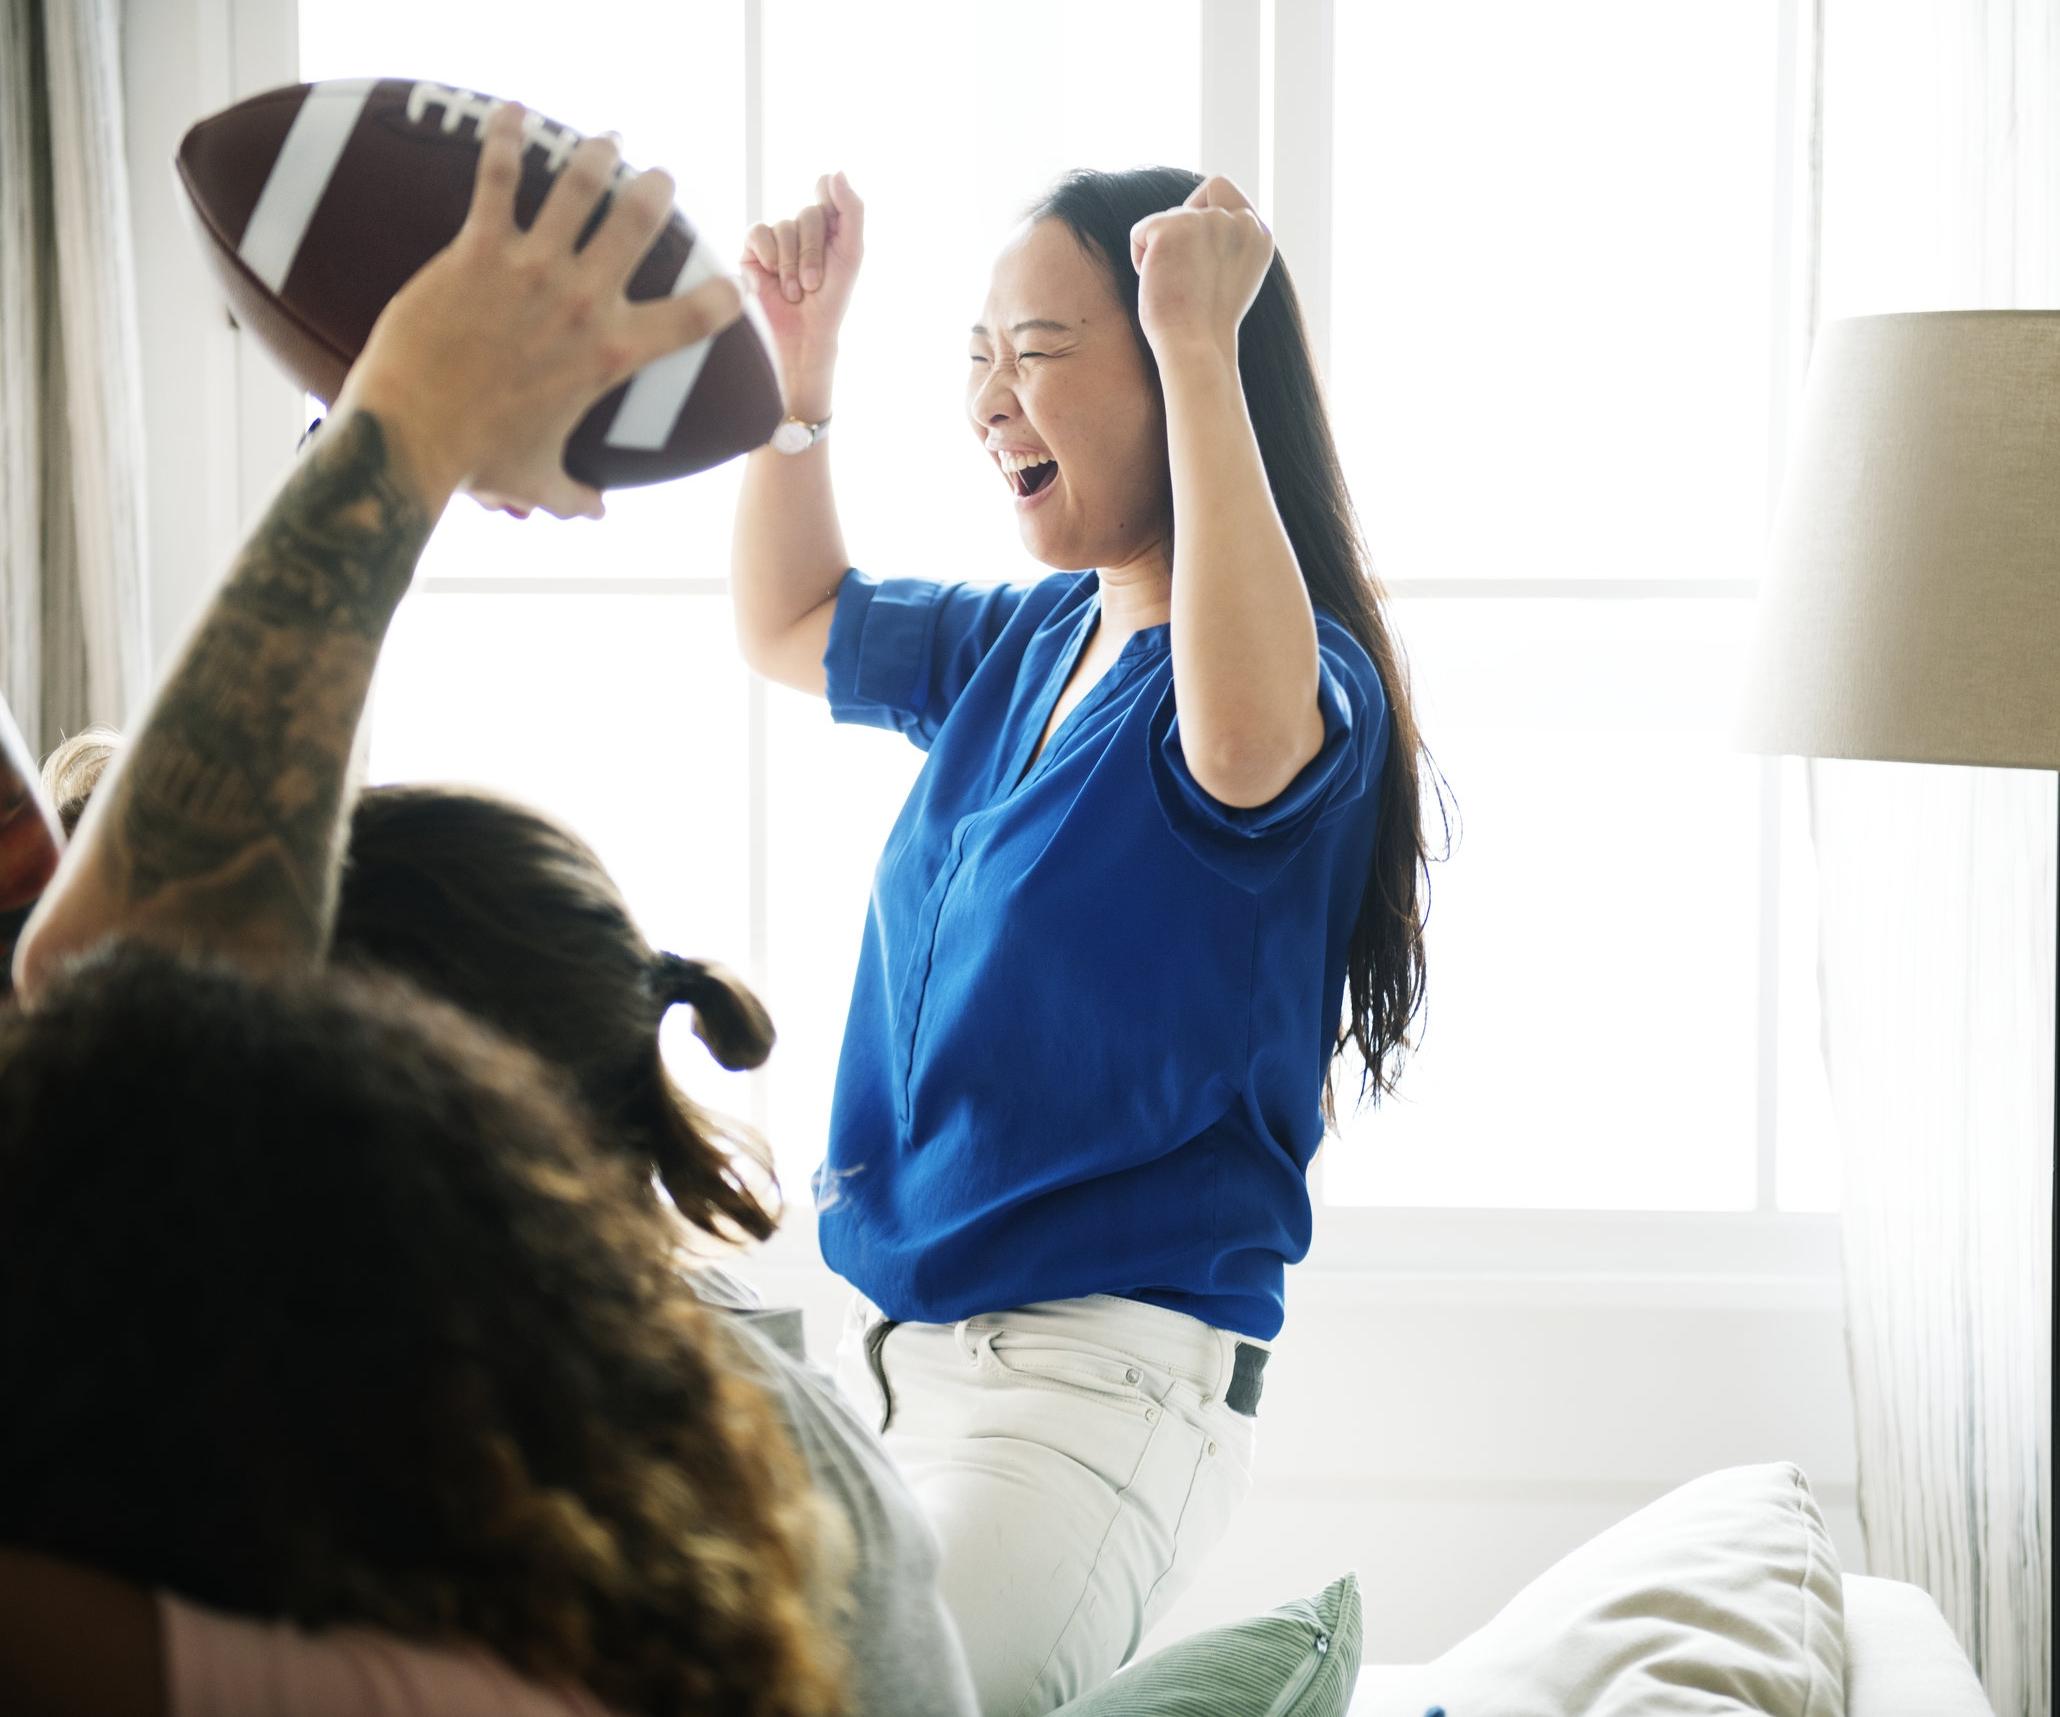 Friends-cheering-sport-league-together-923626260_7000x4821.jpeg